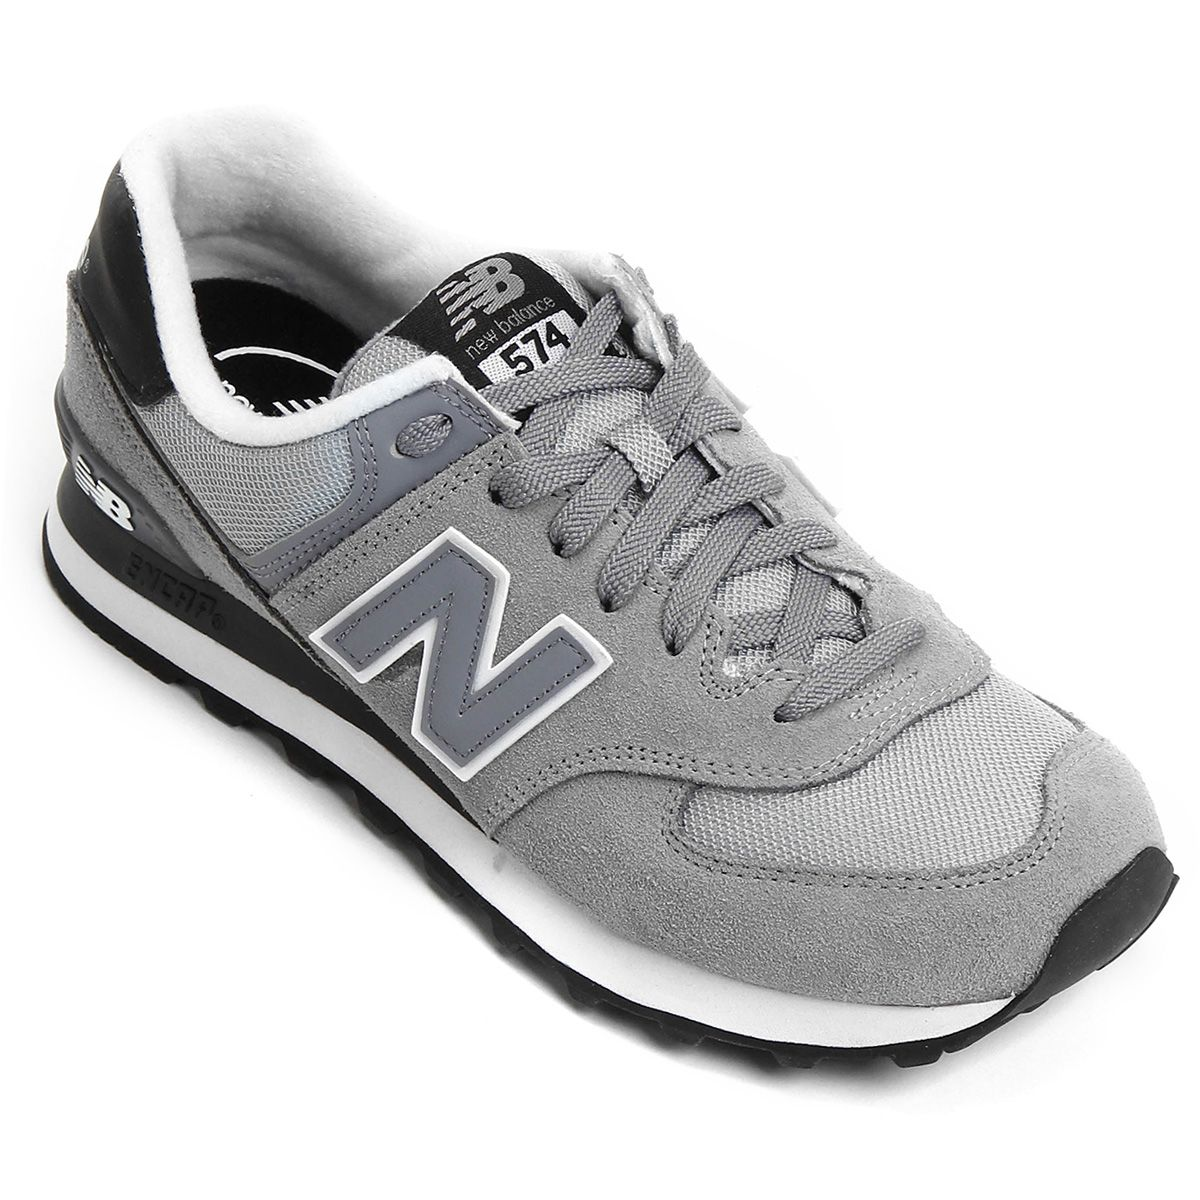 0506f133c8499 Tênis New Balance 574 Core Plus Cinza e Preto   Netshoes   Sneakers ...